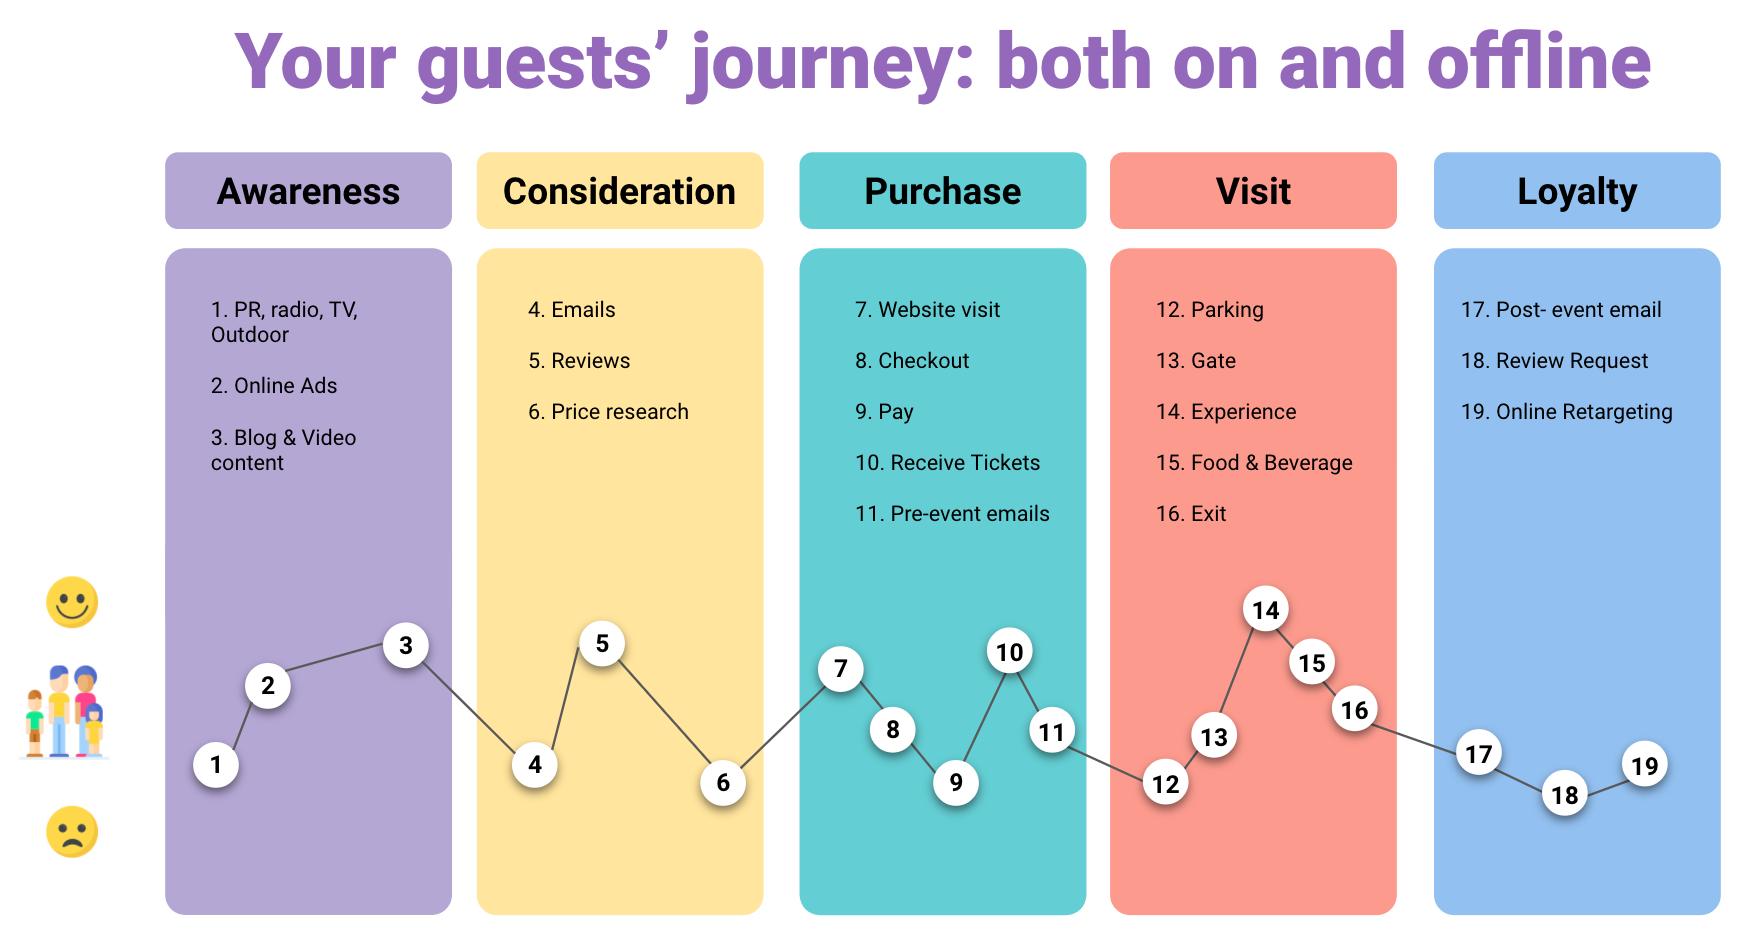 customer journey in leisure